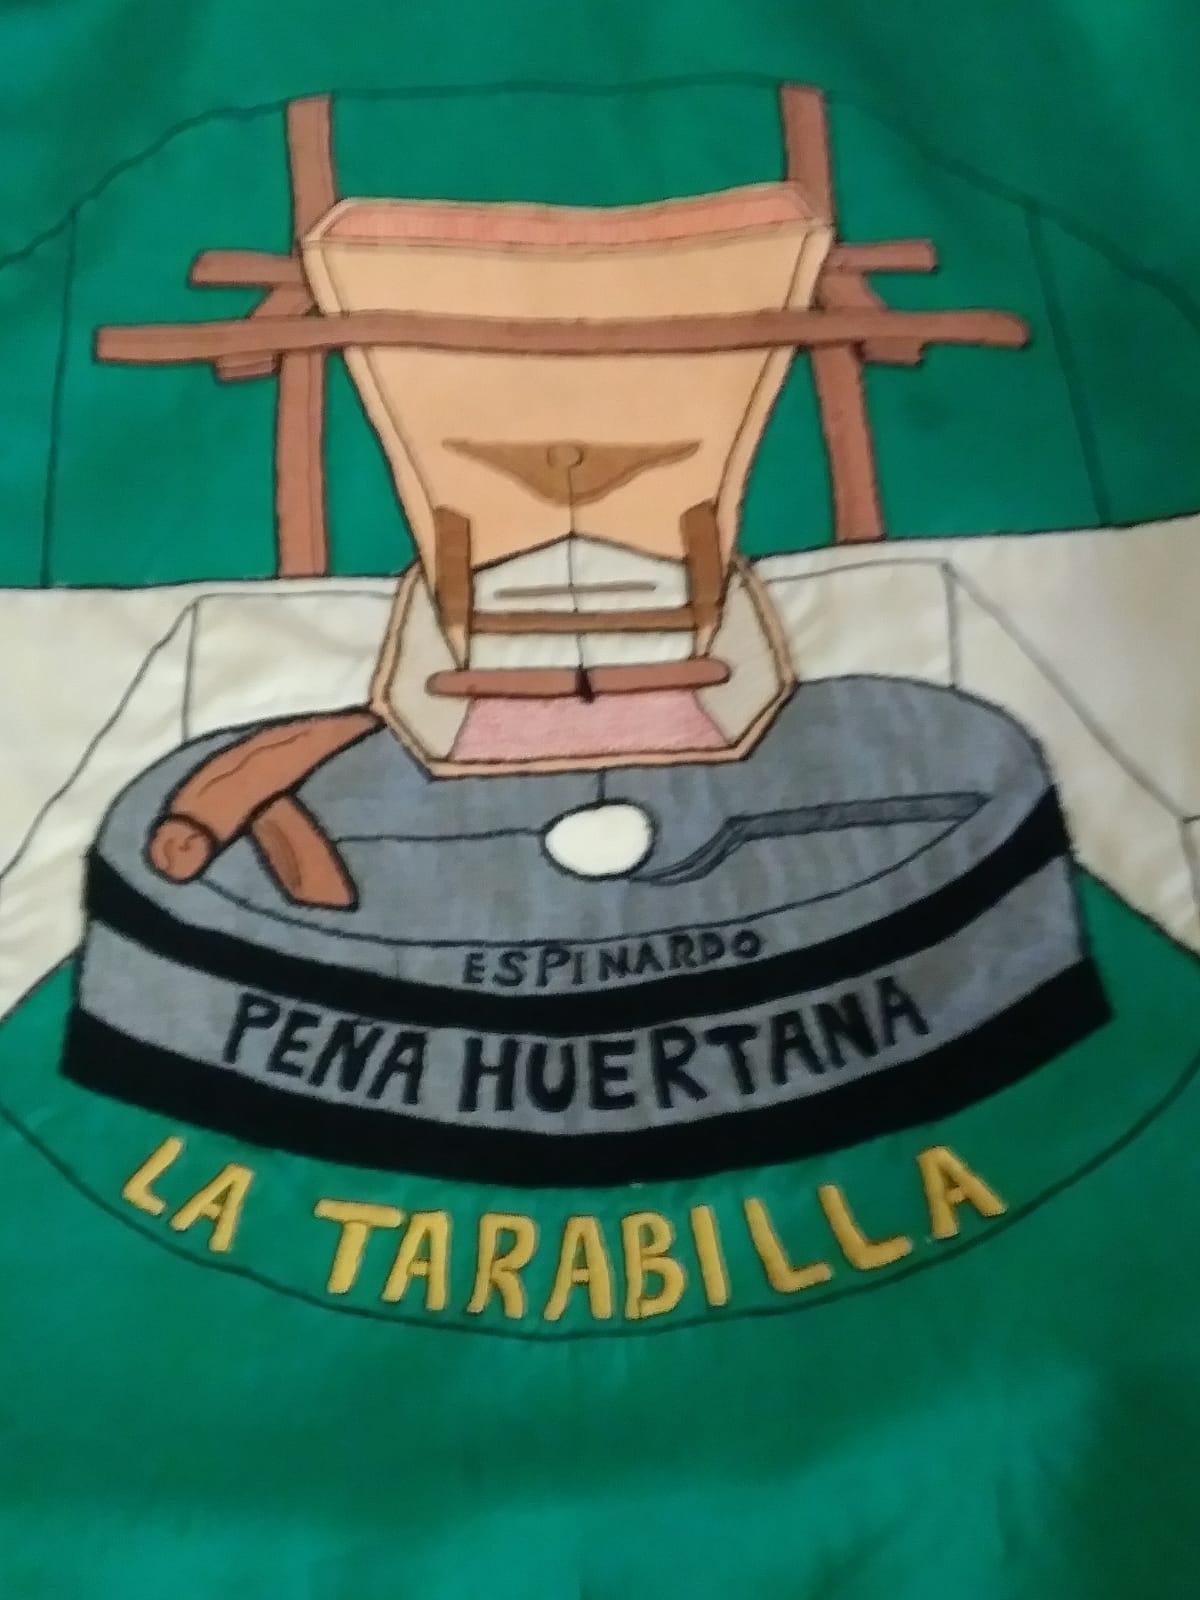 Logo - Banderola - Peña Huertana La Tarabilla